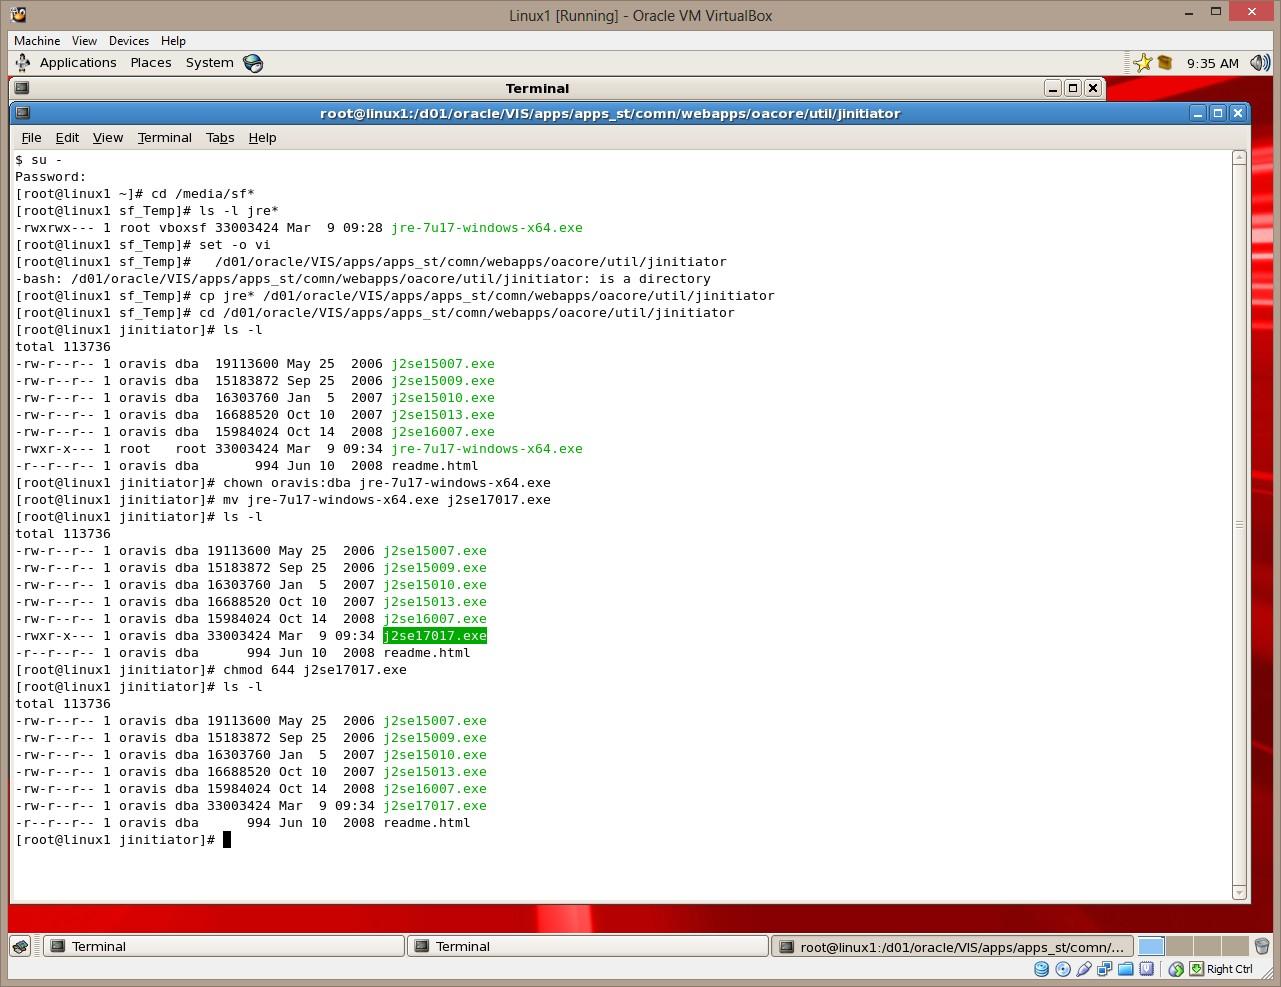 oracle jinitiator download for windows 7 64 bit